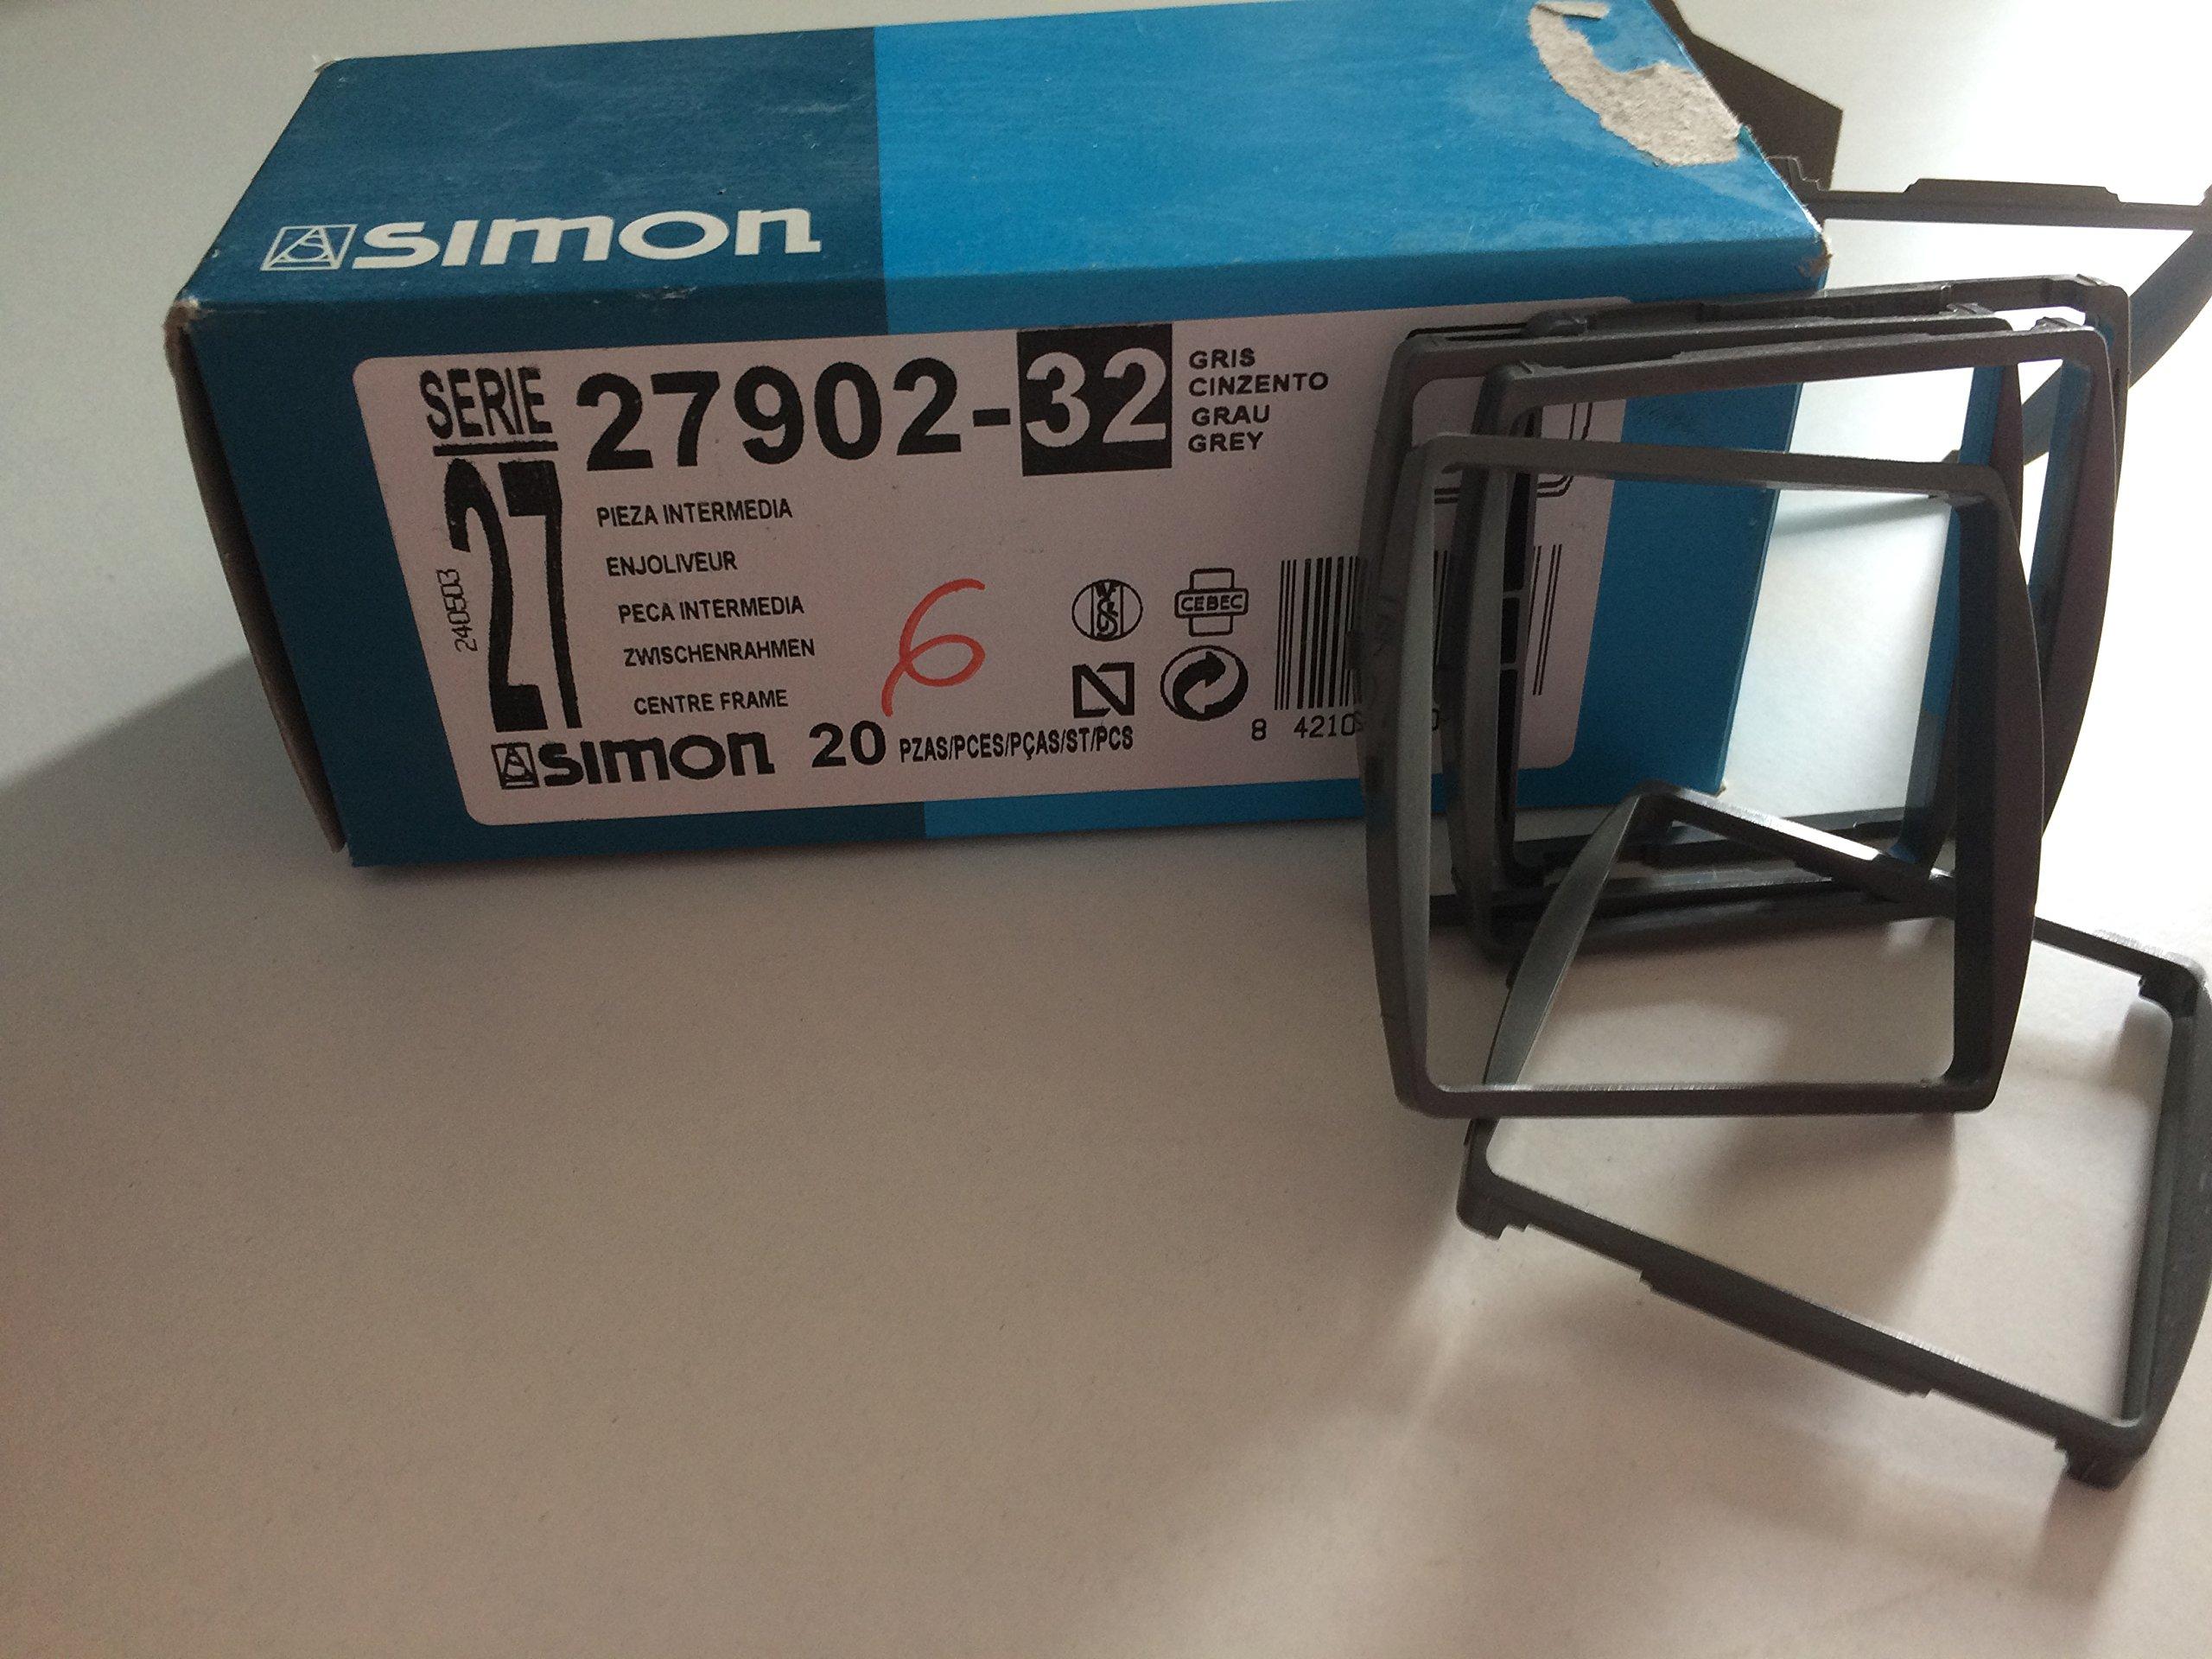 Simon 27902-32 Pieza Intermedia Modulo Ancho Gris